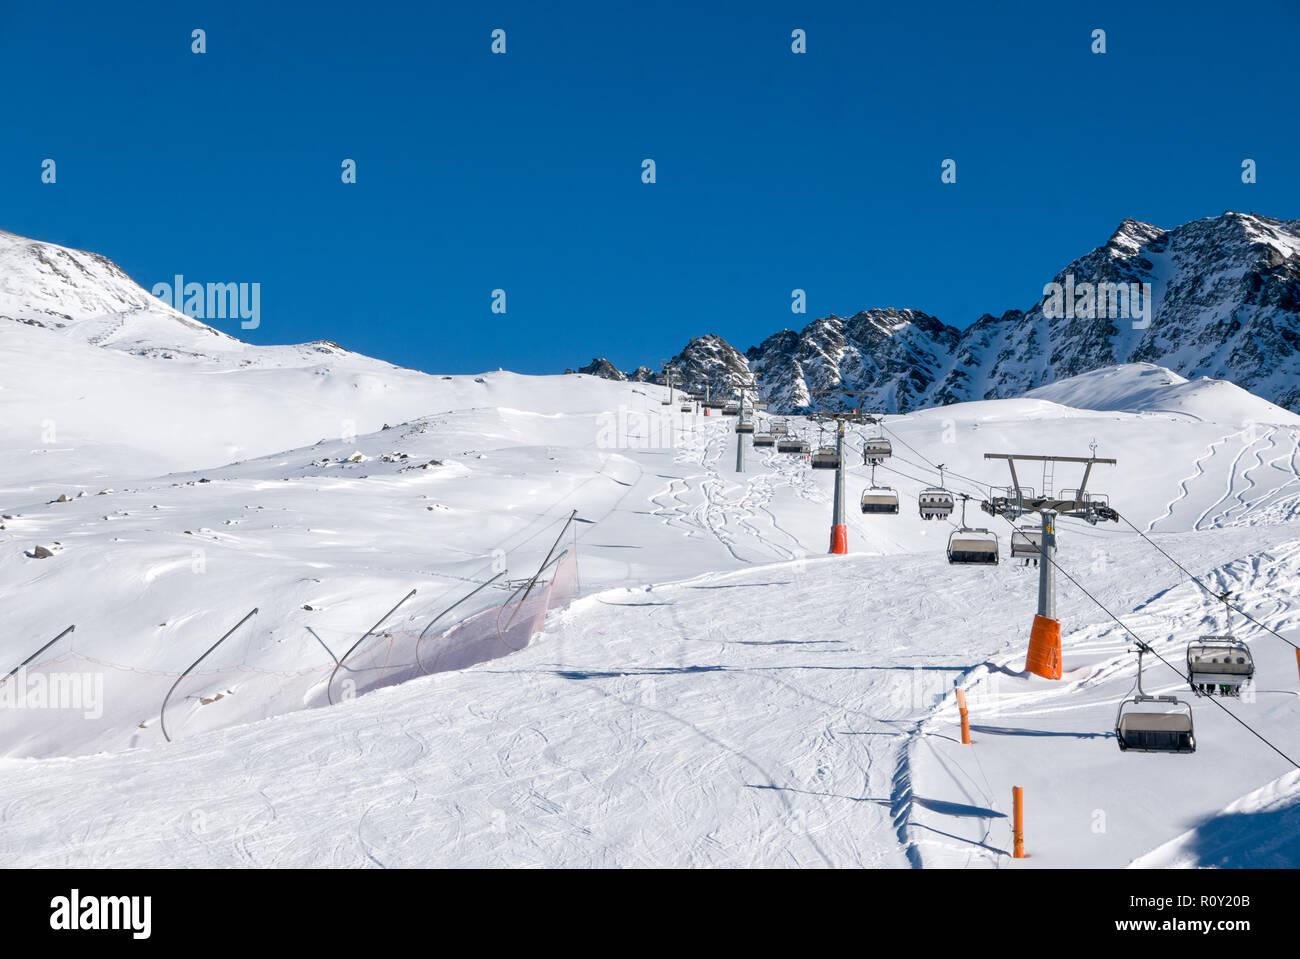 ski holiday, sunny day in popular alpine ski resort, solda (sulden